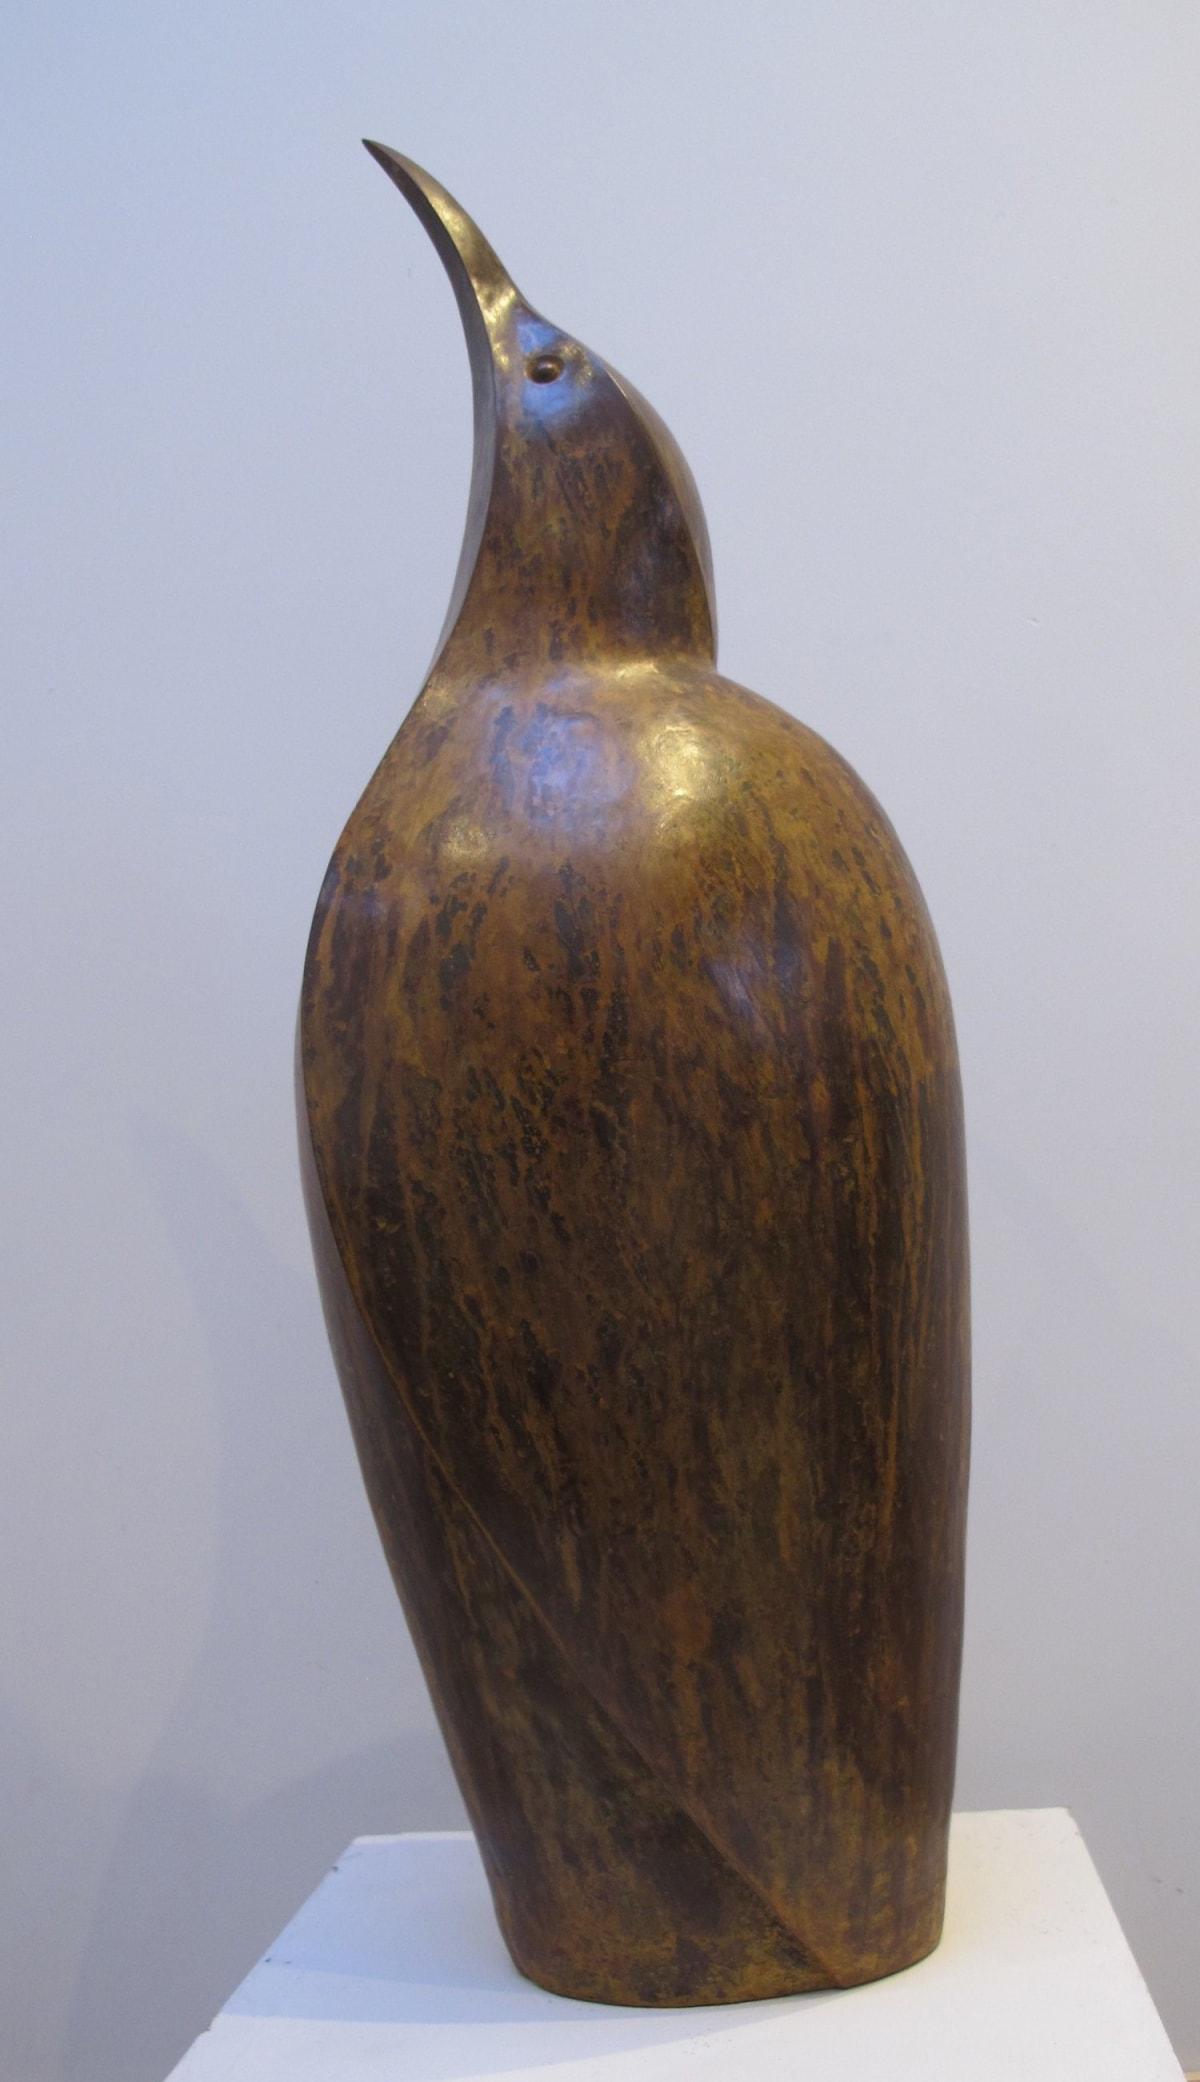 Paul Harvey Bittern, 2019 Mixed Media Sculpture Mixed Metal Resin 69 x 16 x 22 cm 27 1/8 x 6 1/4 x 8 5/8 in Open Edition